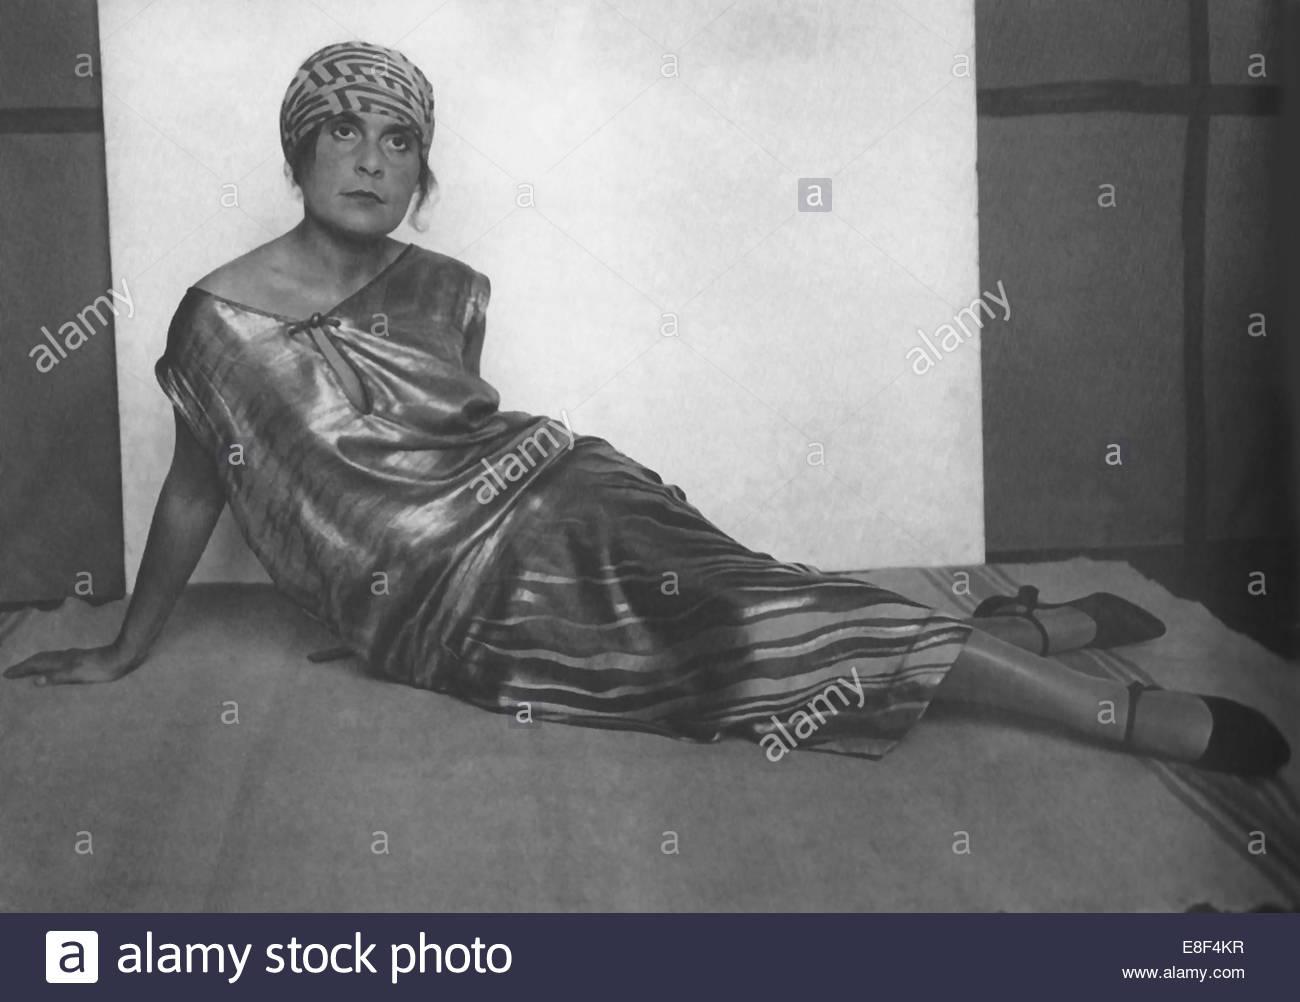 Lilya Brik Artist: Rodtchenko, Alexandre (1891-1956) Photo Stock